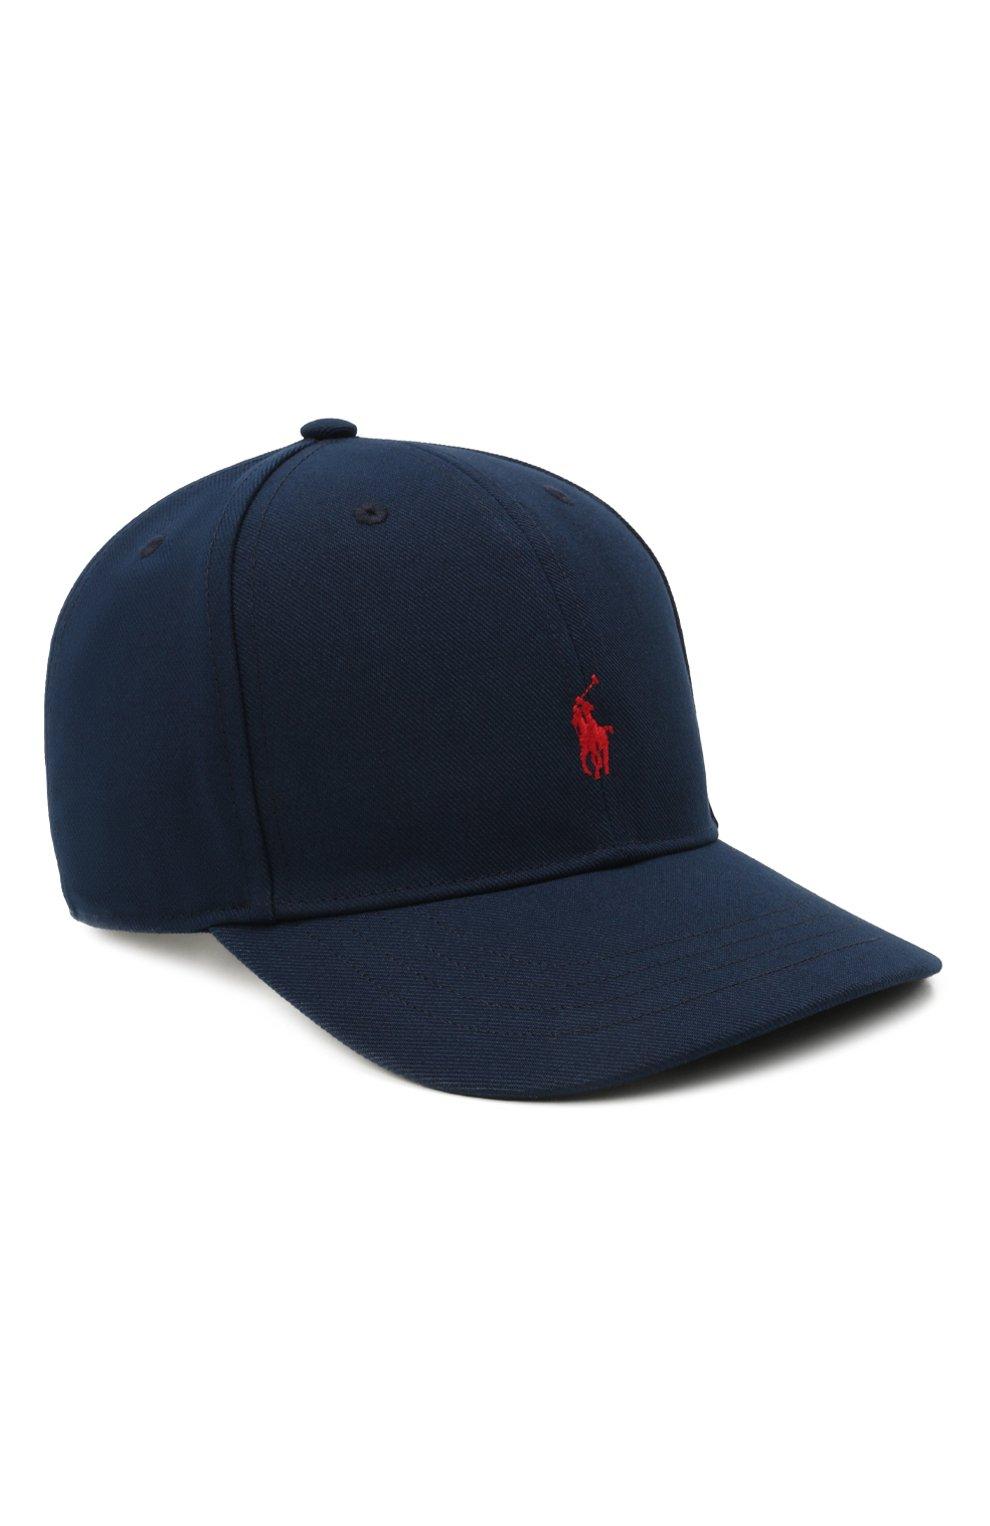 Детская бейсболка POLO RALPH LAUREN темно-синего цвета, арт. 323844896 | Фото 1 (Материал: Текстиль, Синтетический материал)